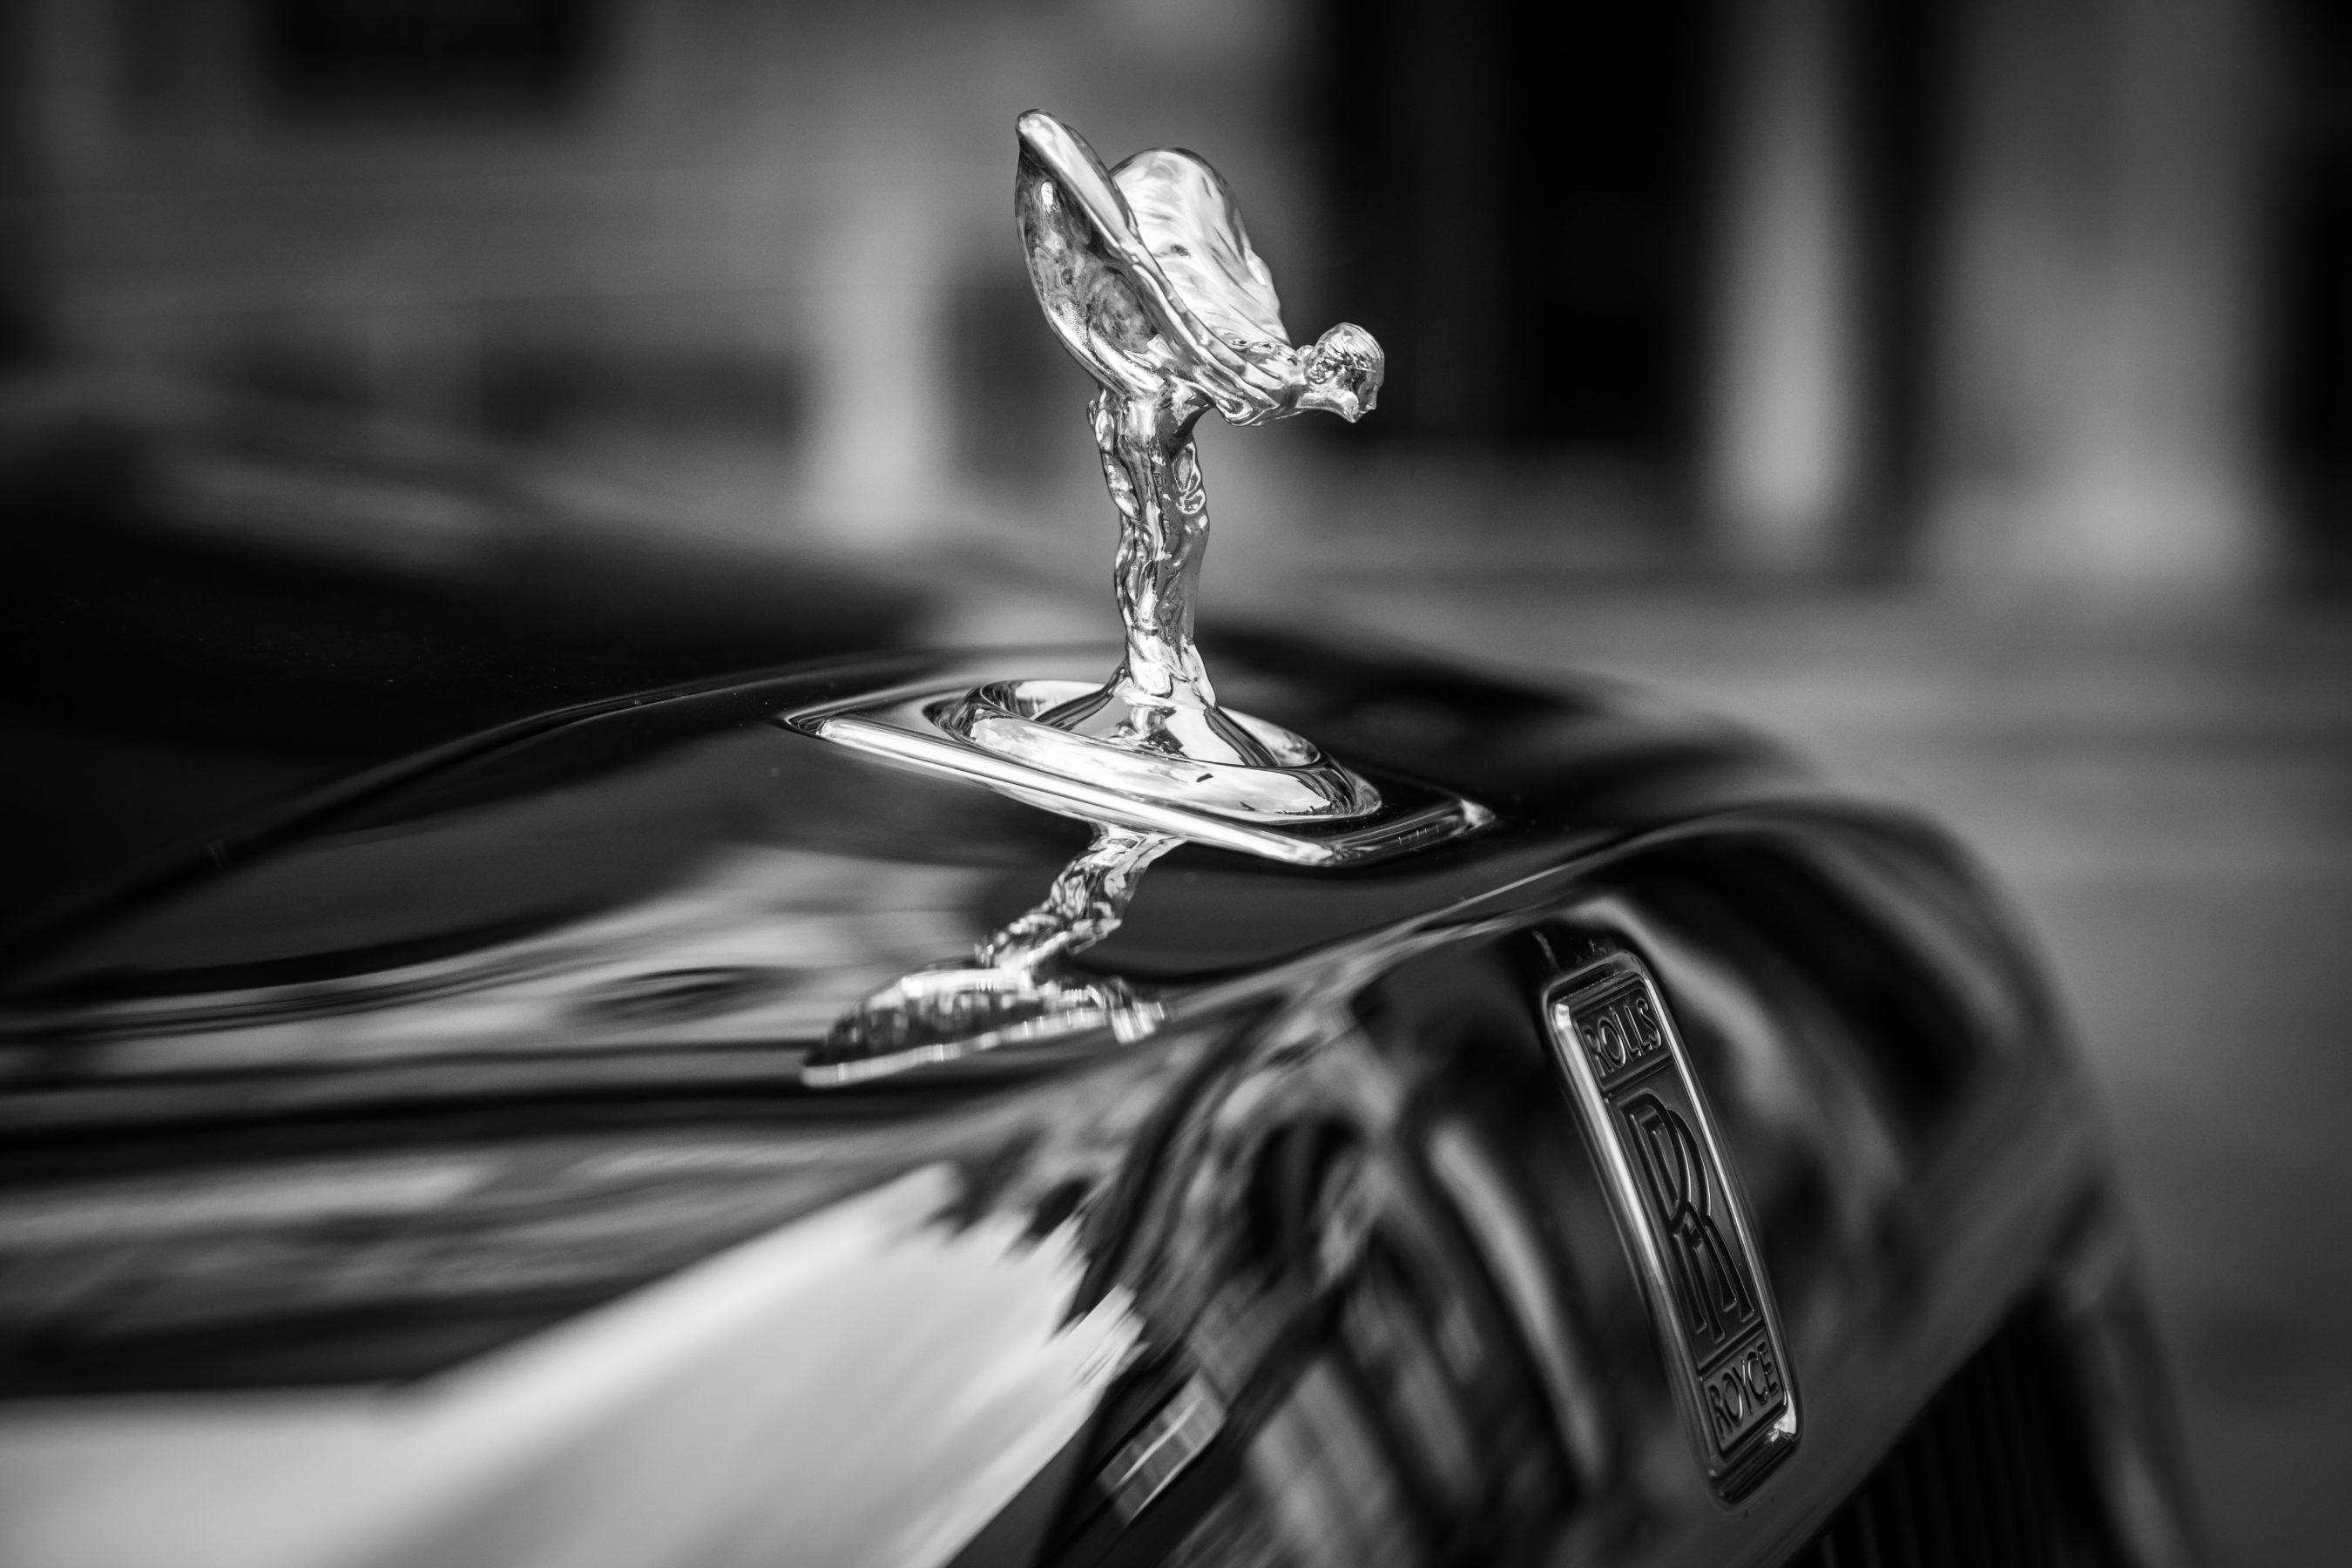 Rolls-Royce Motor Cars Leeds